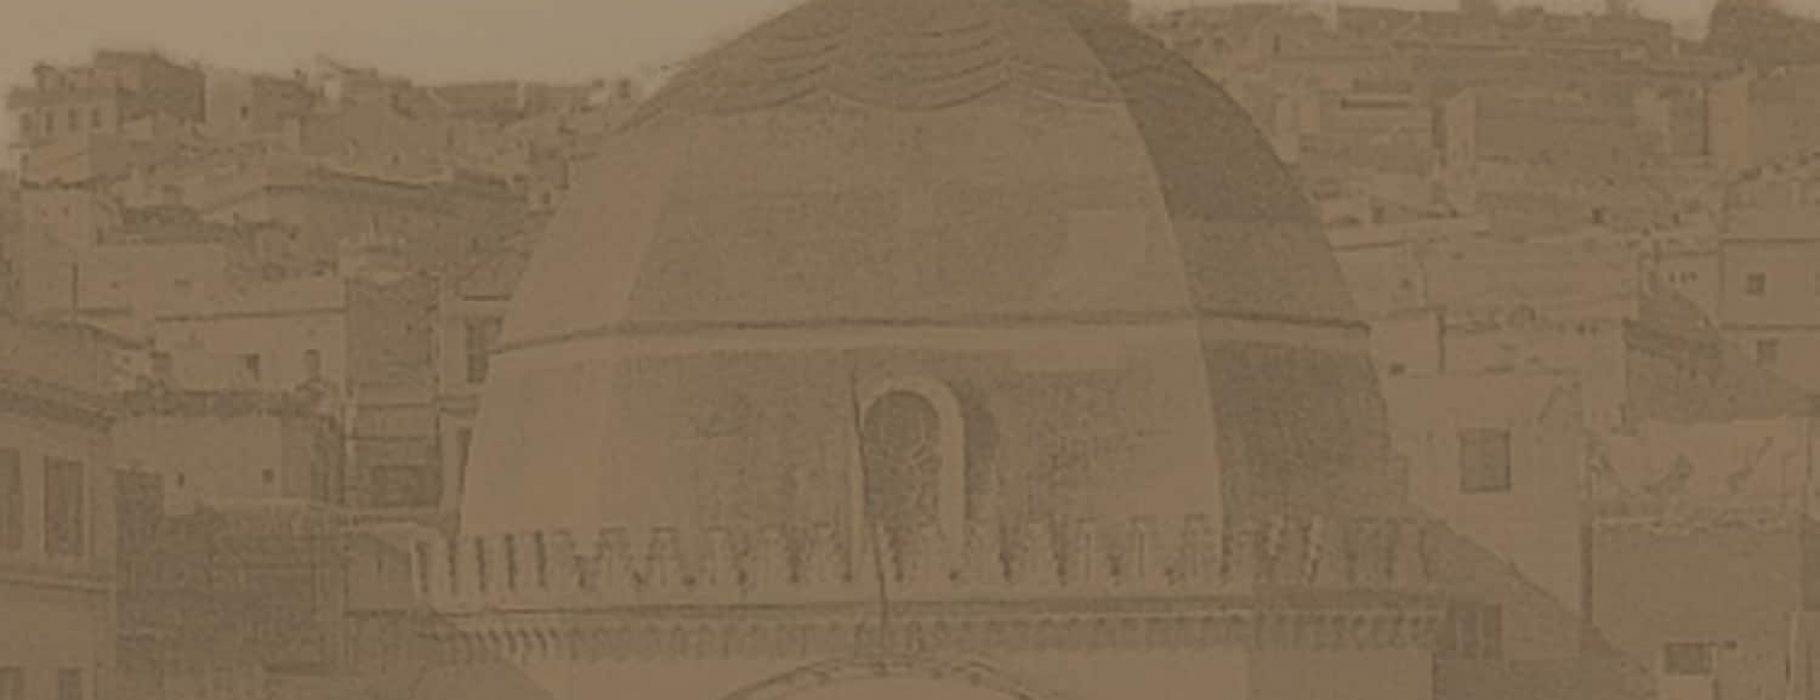 Sepia-toned image of the Grand Synagogue, Algiers, Algeria